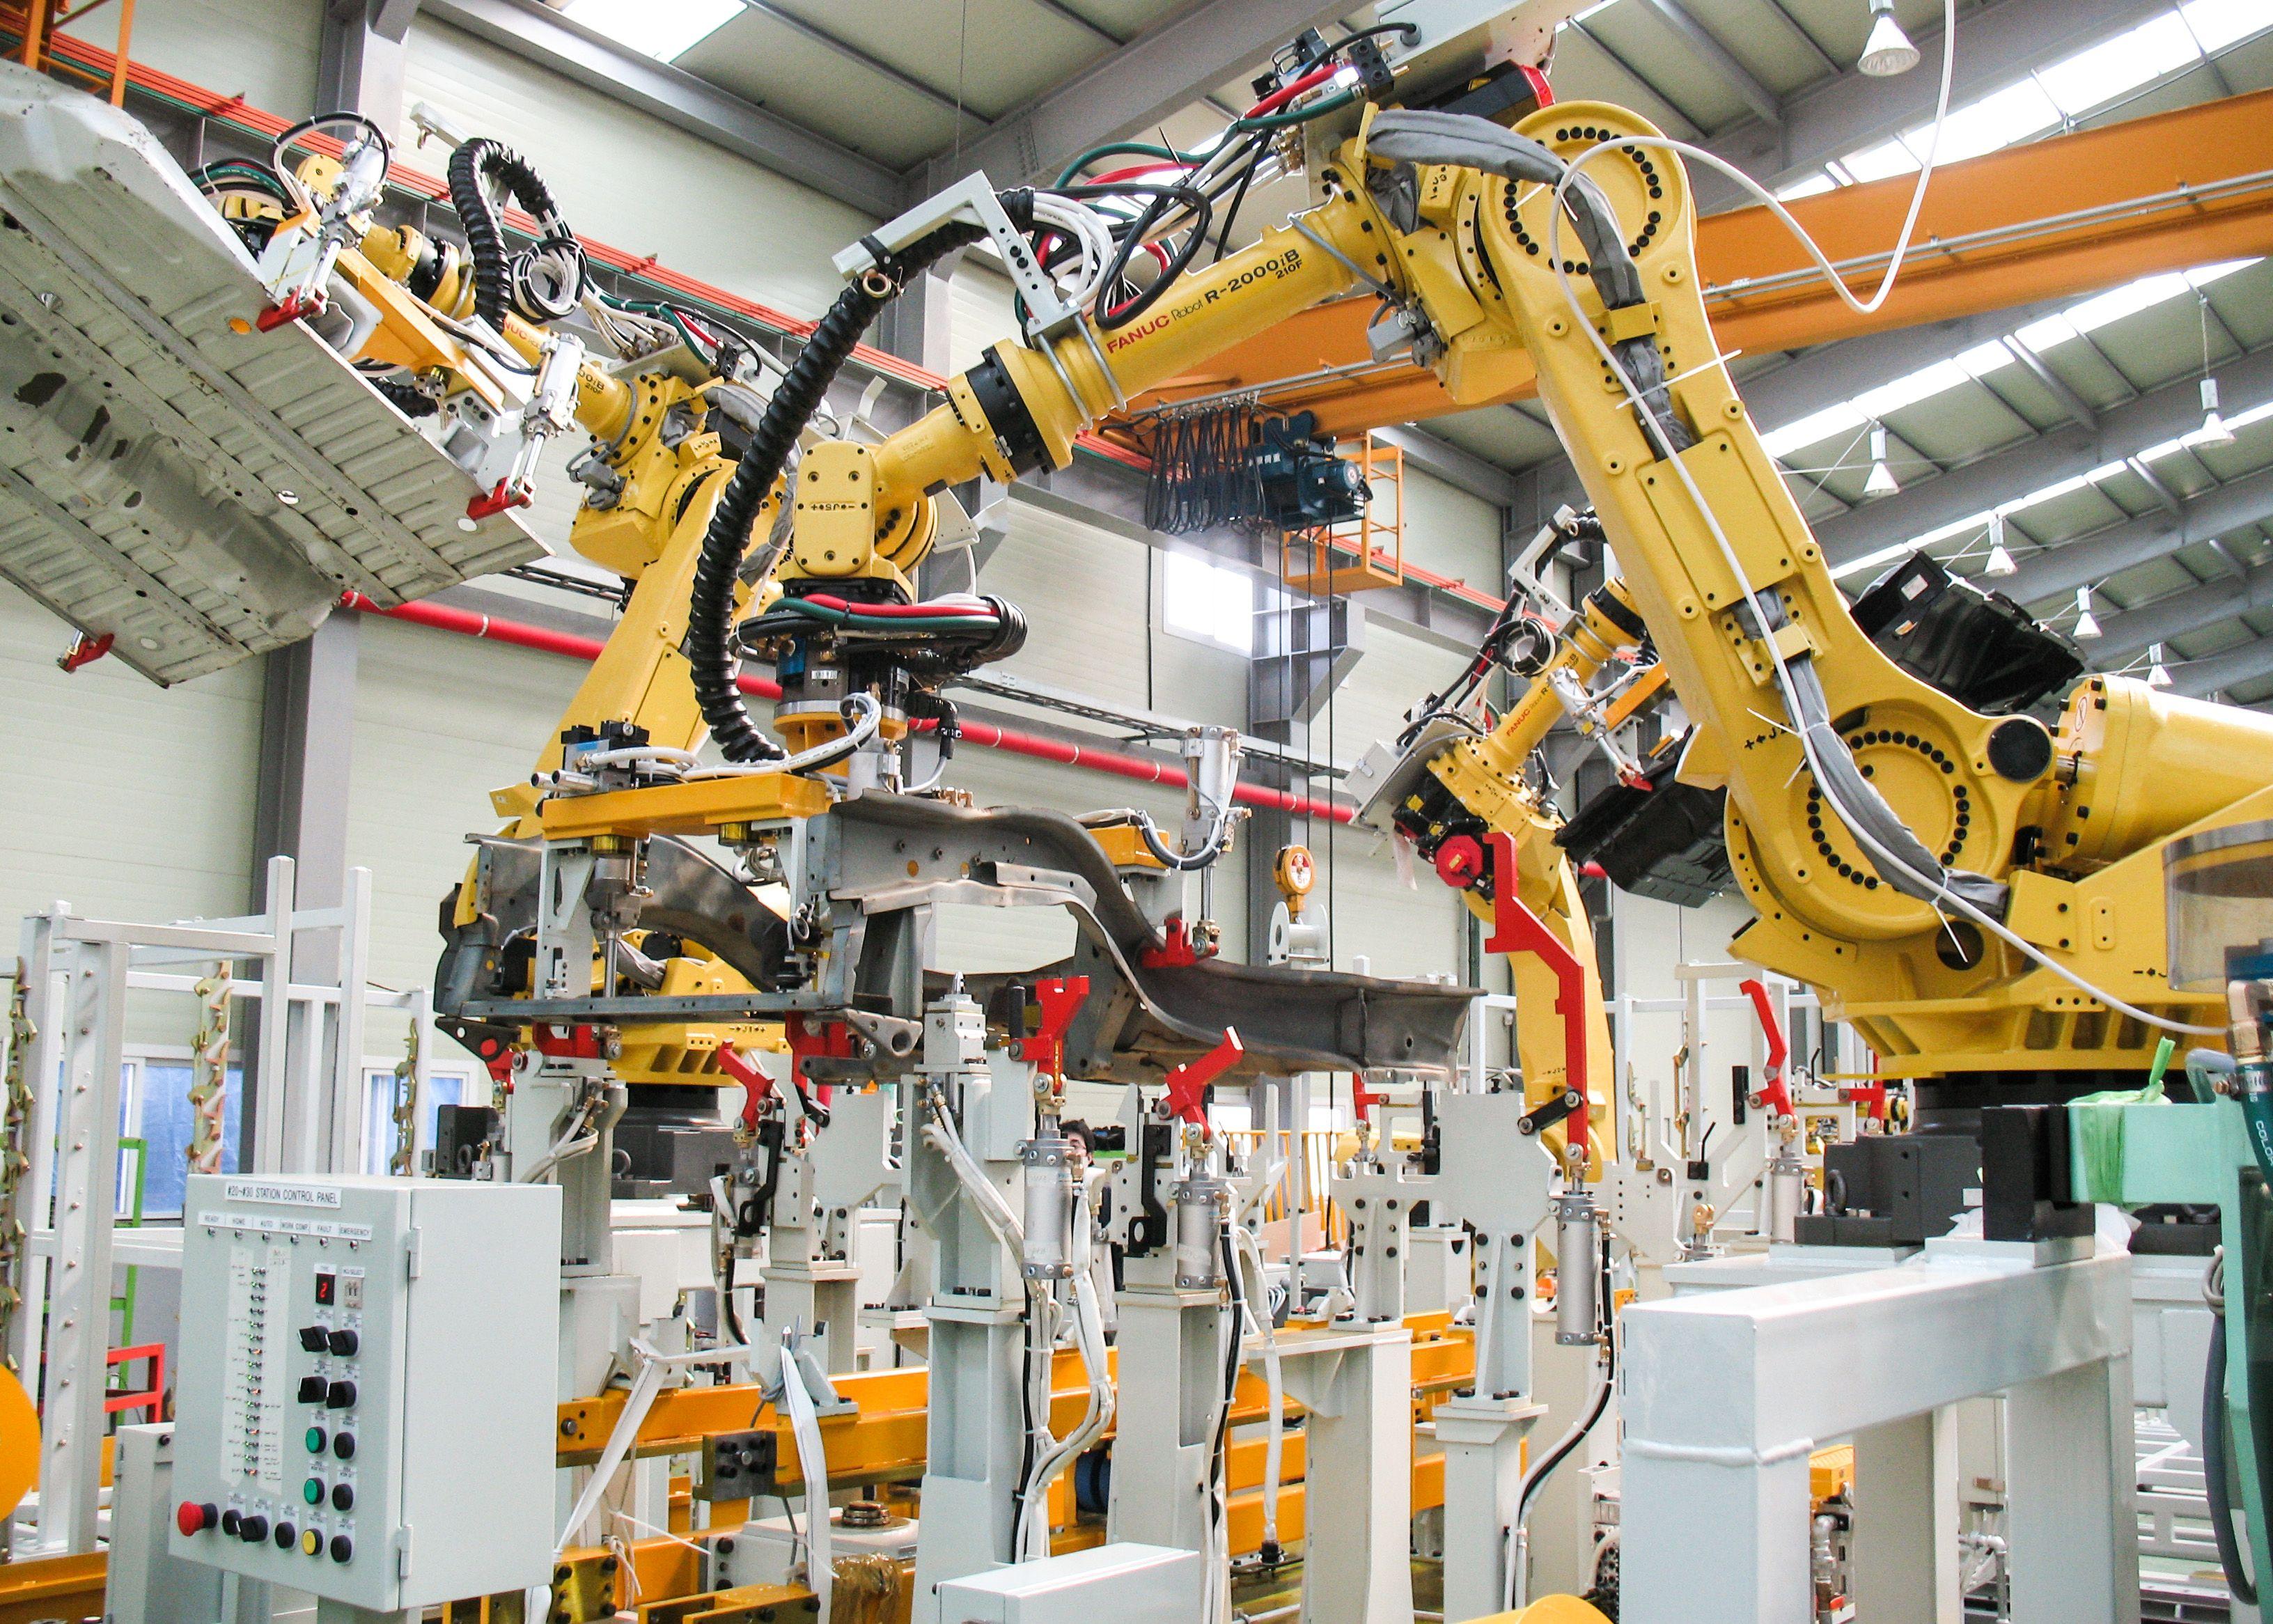 A FANUC R2000iB Industrial Robot [3264 2332] | Hard Surface